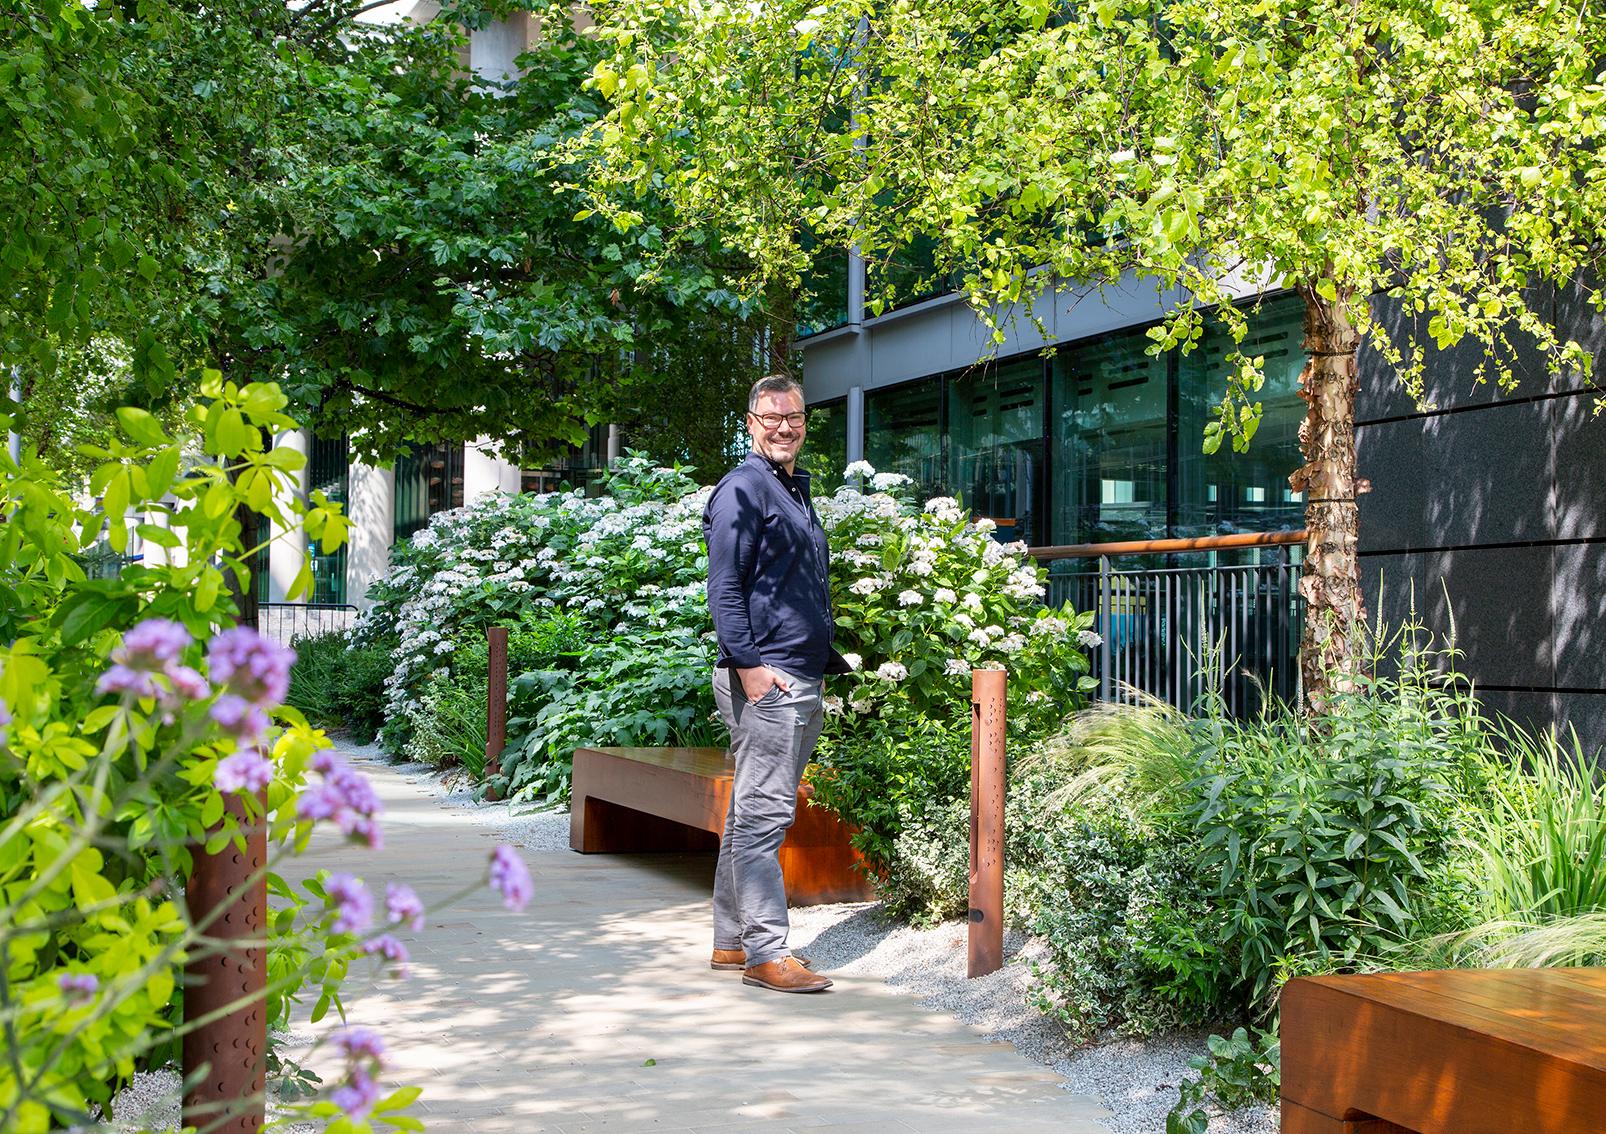 Stuart Carruthers - Learning & Organisational Development Trainer, City of London